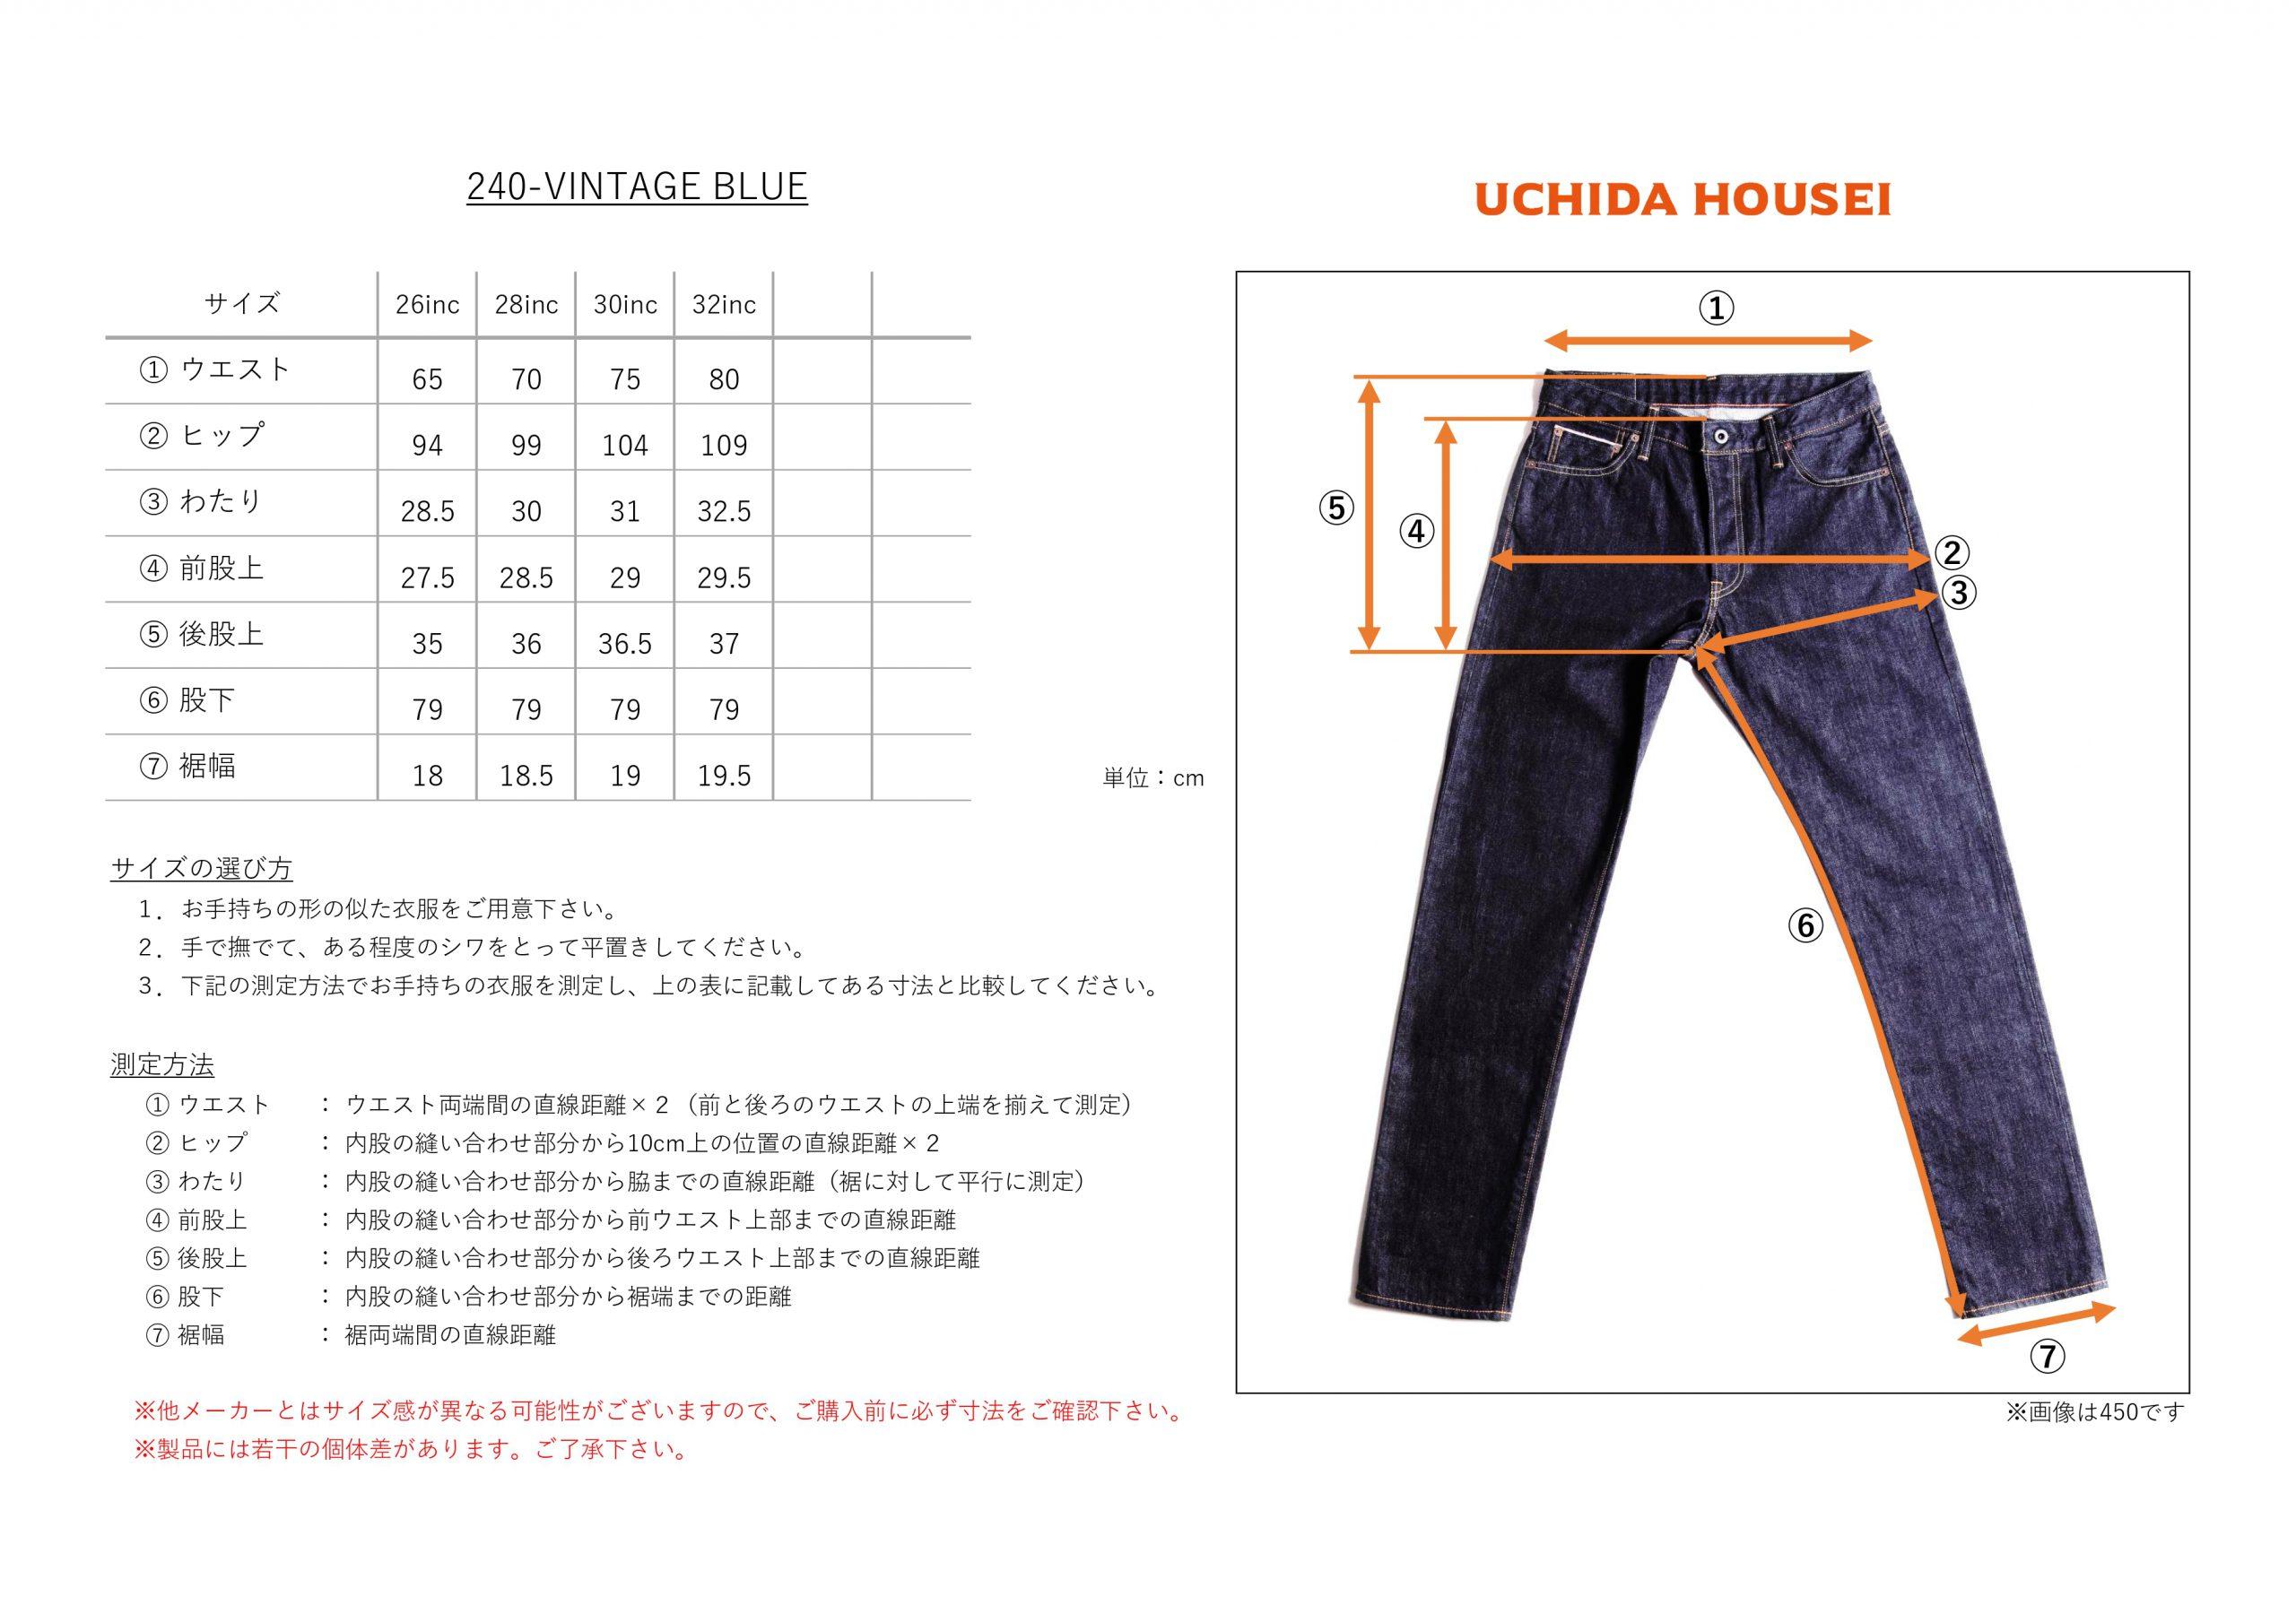 240-VINTAGE BLUE【ビンテージブルー】